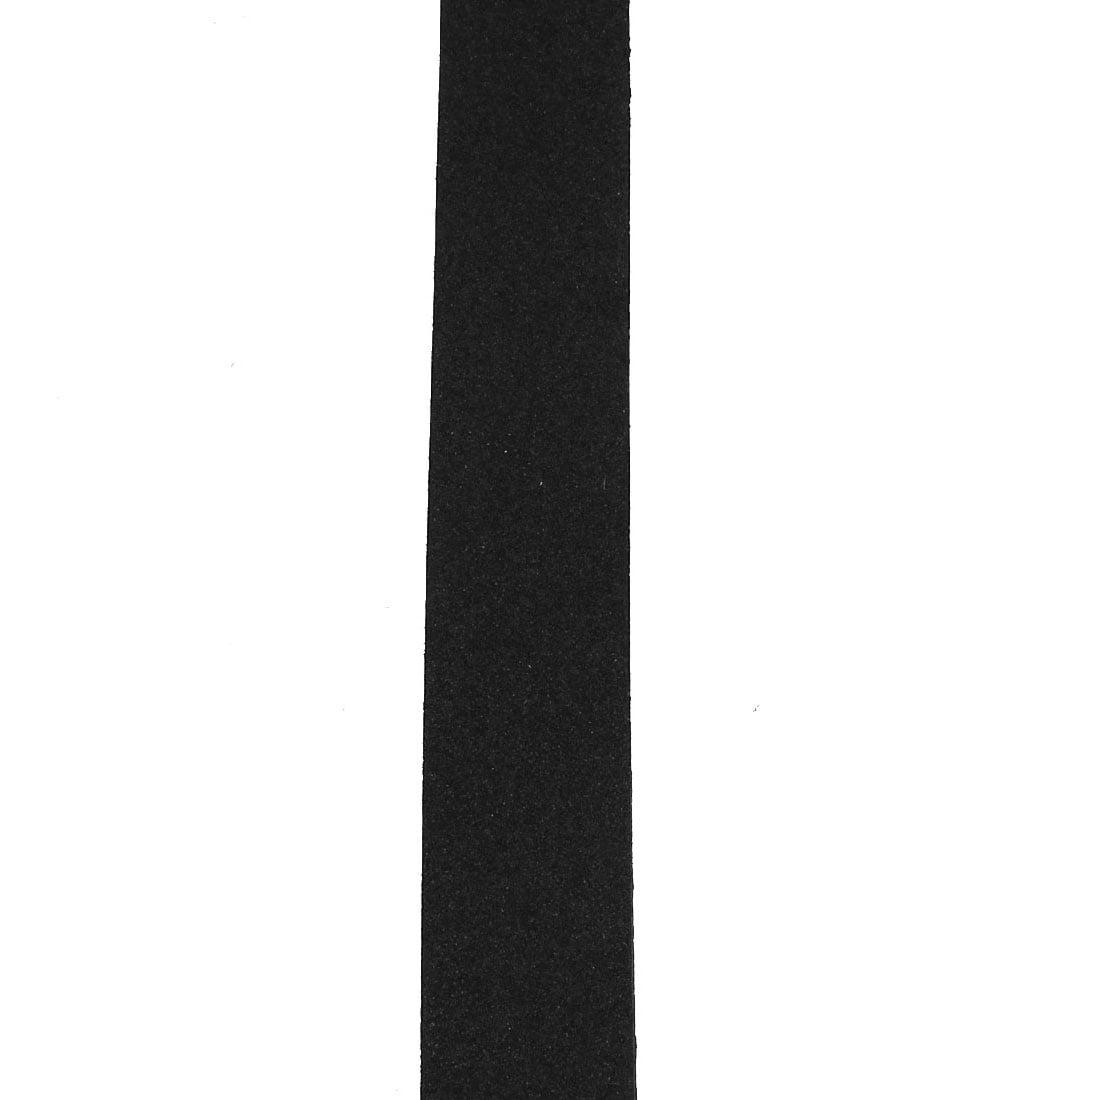 10Pcs 10mm Width 1mm Thickness Single Side Sponge Foam Tape Black 10M Length - image 2 of 4